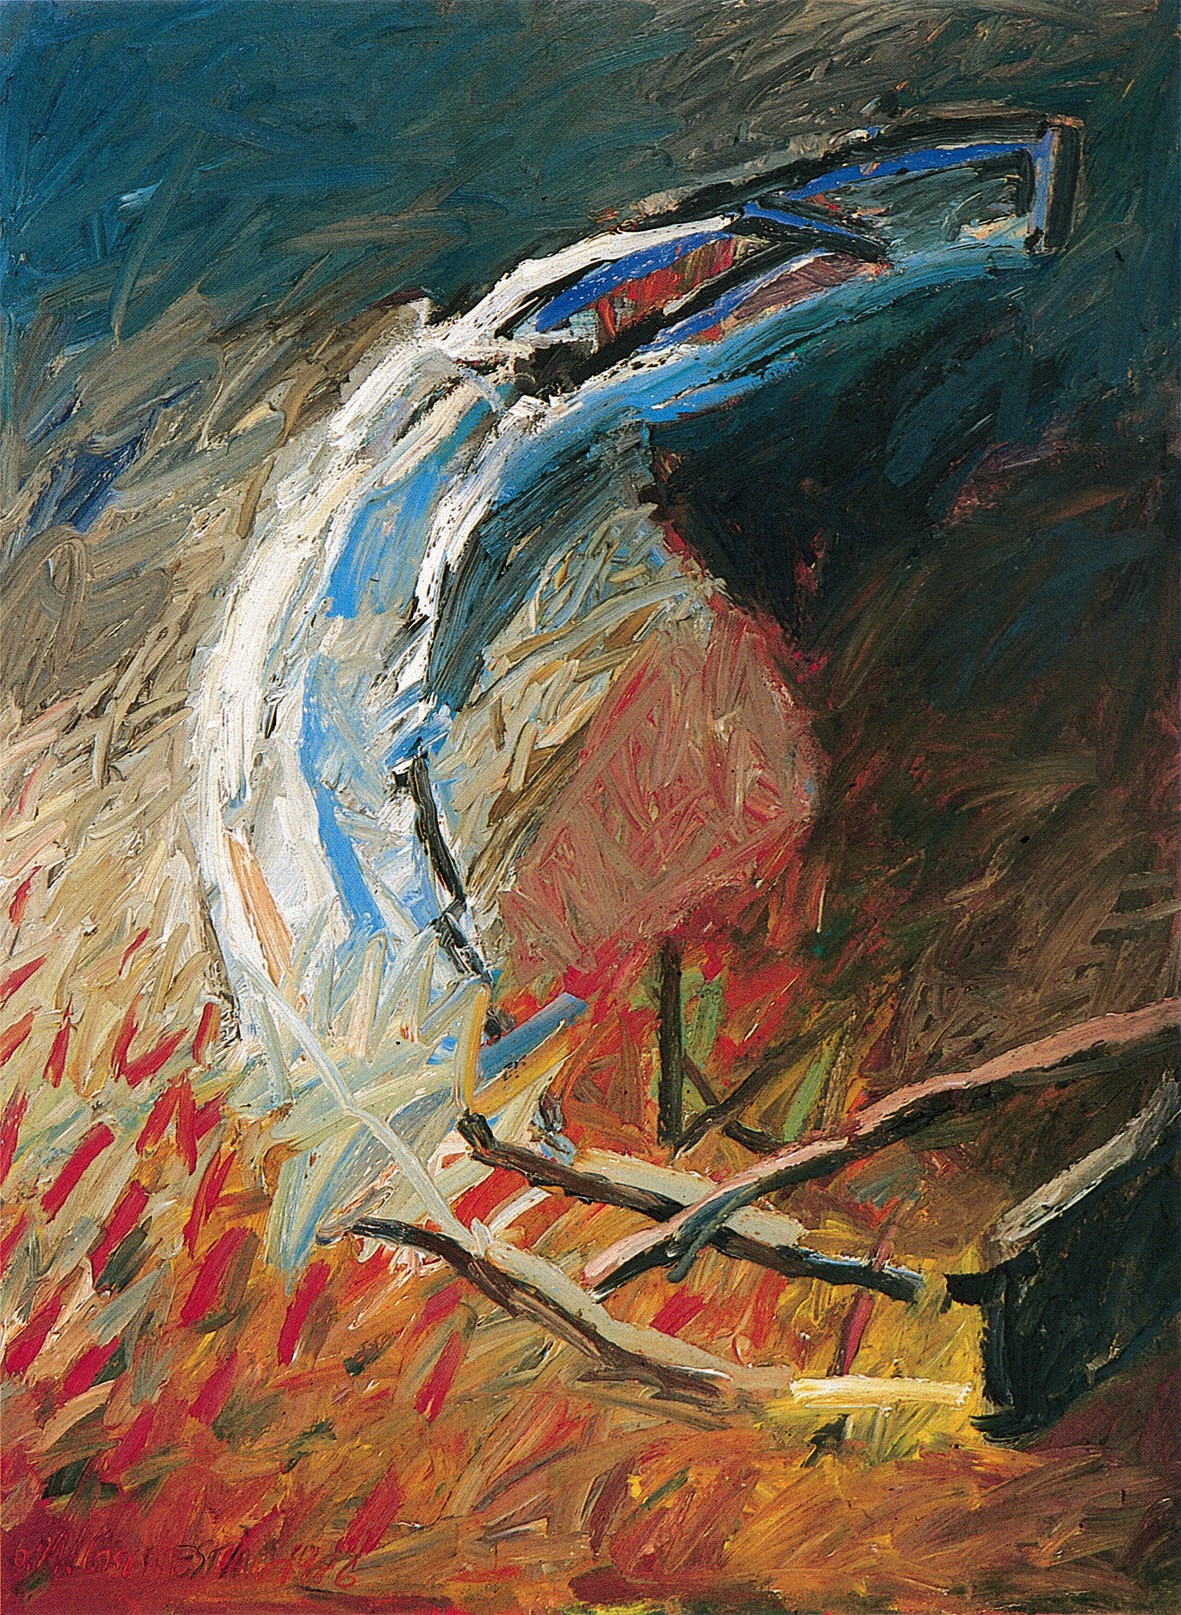 Giso Westing (*1955) Ohne Titel, 1986Öl auf Leinwand 200 x 150 cm